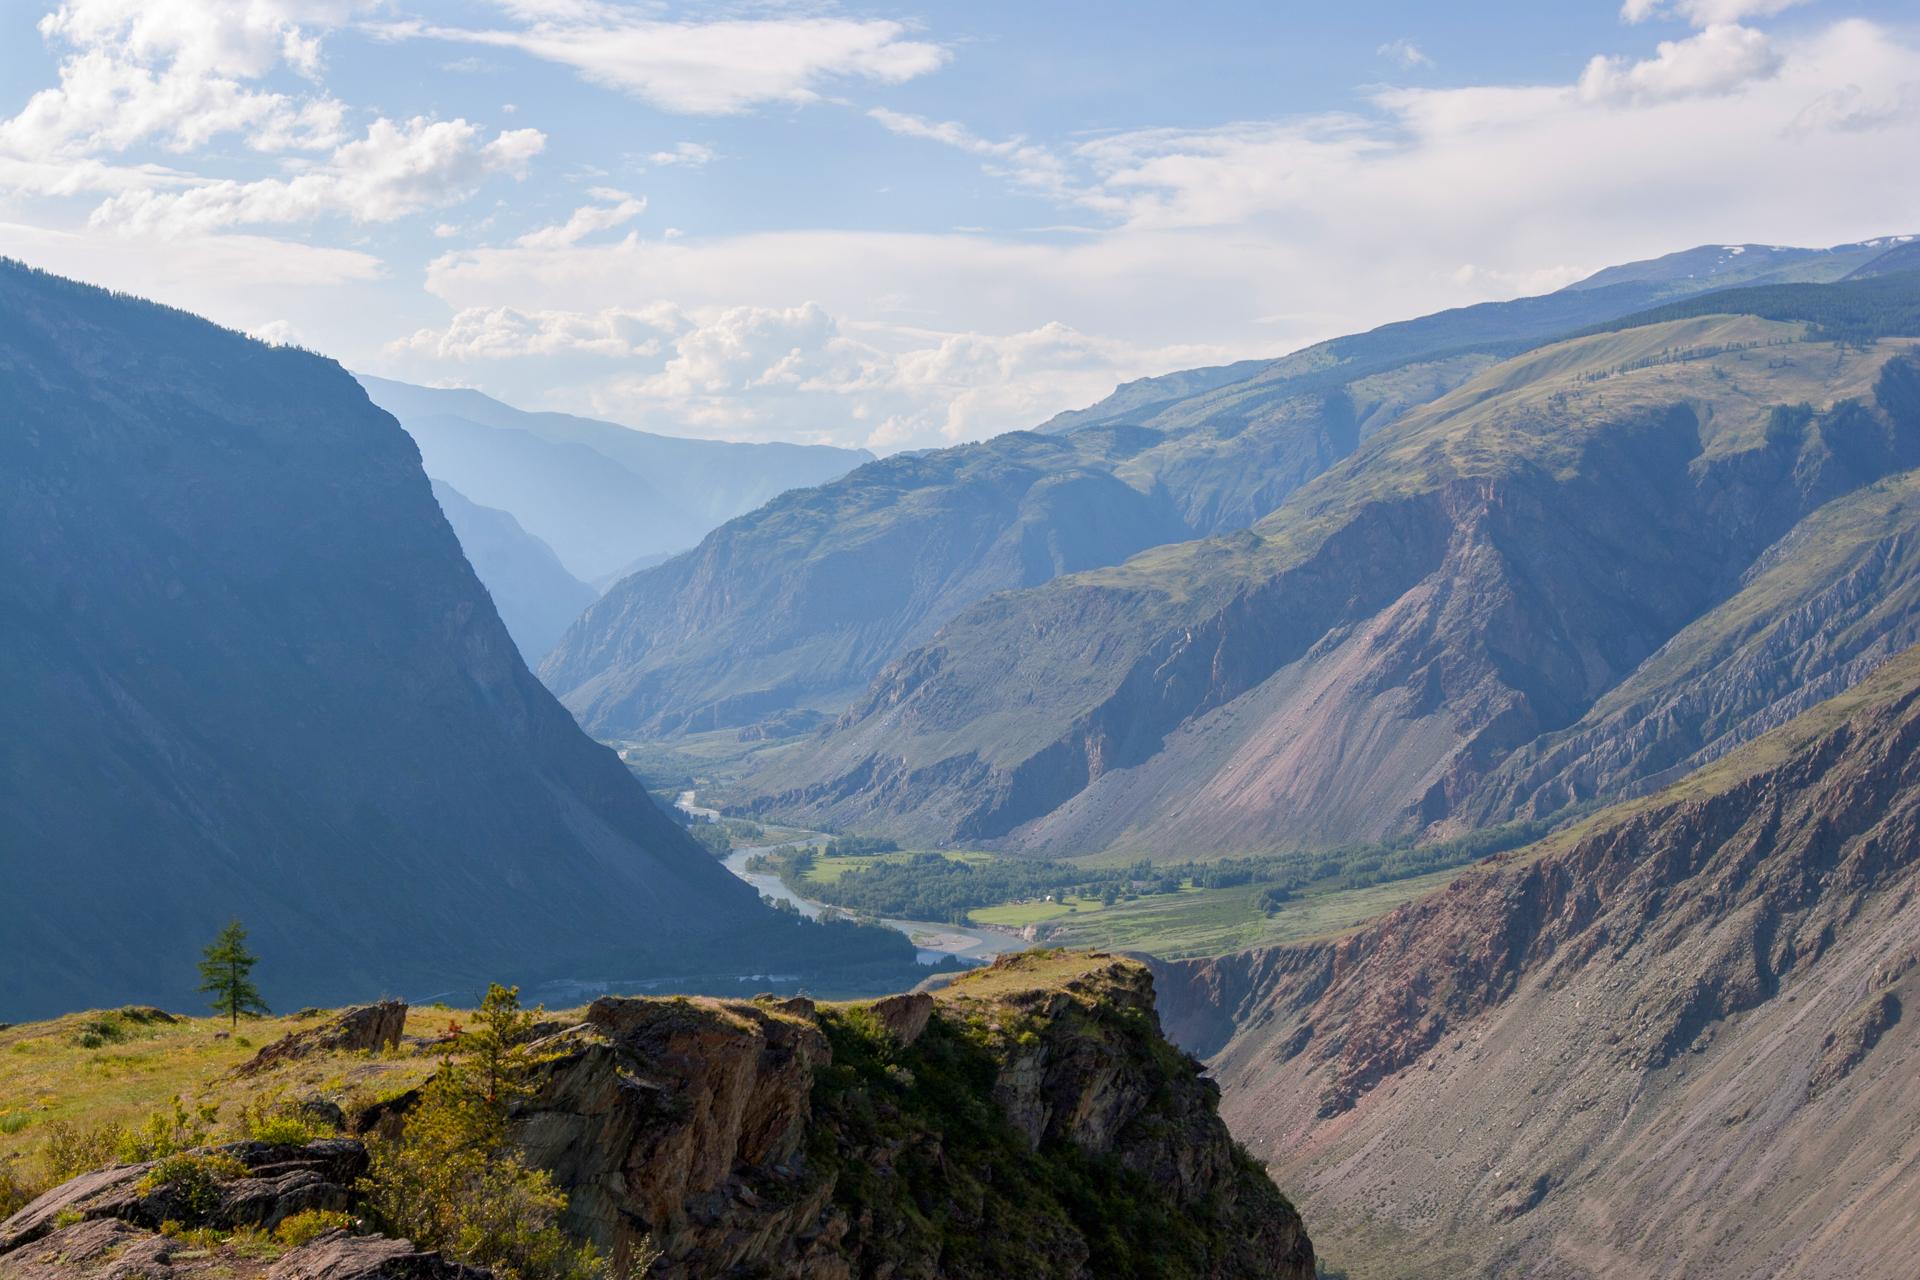 20 1 - 10 locais no Altay que vale a pena visitar